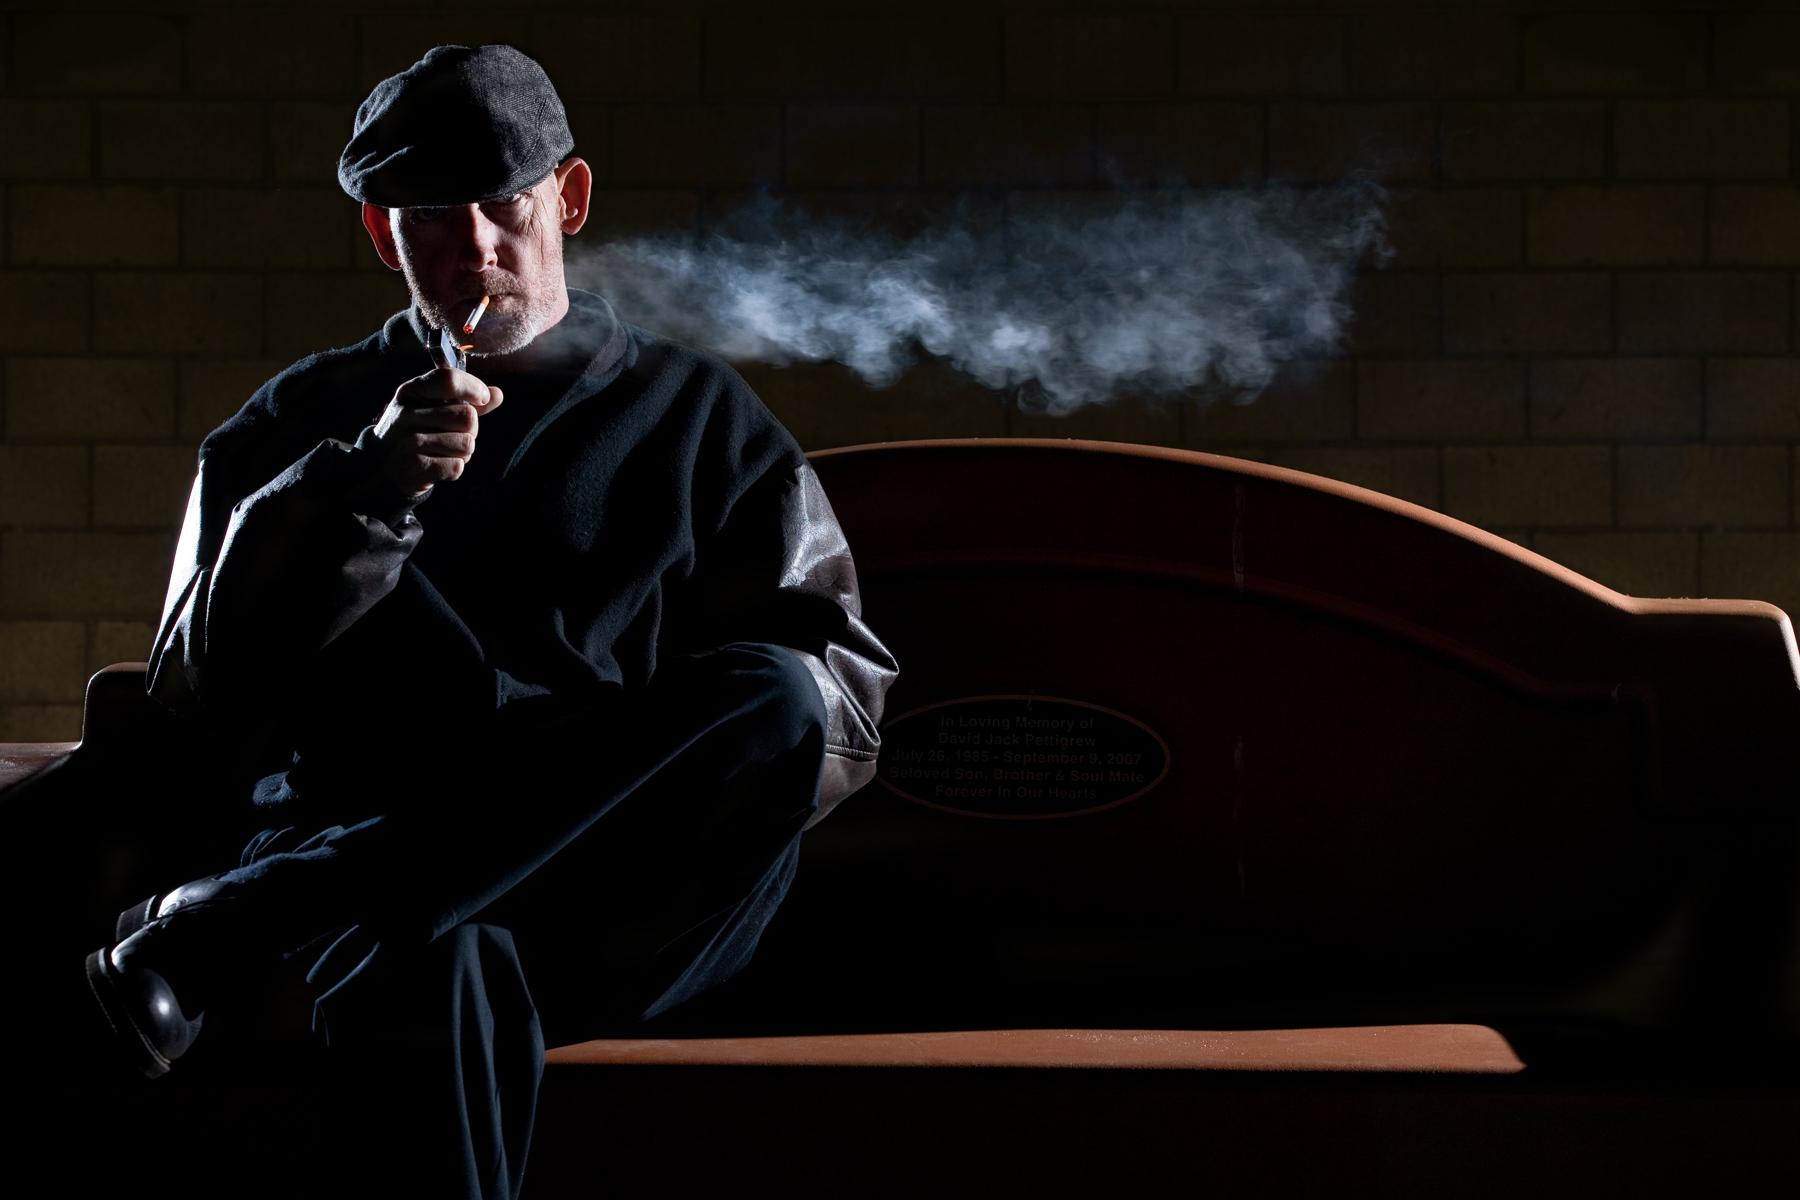 Doug-Bench-Smoke.jpg